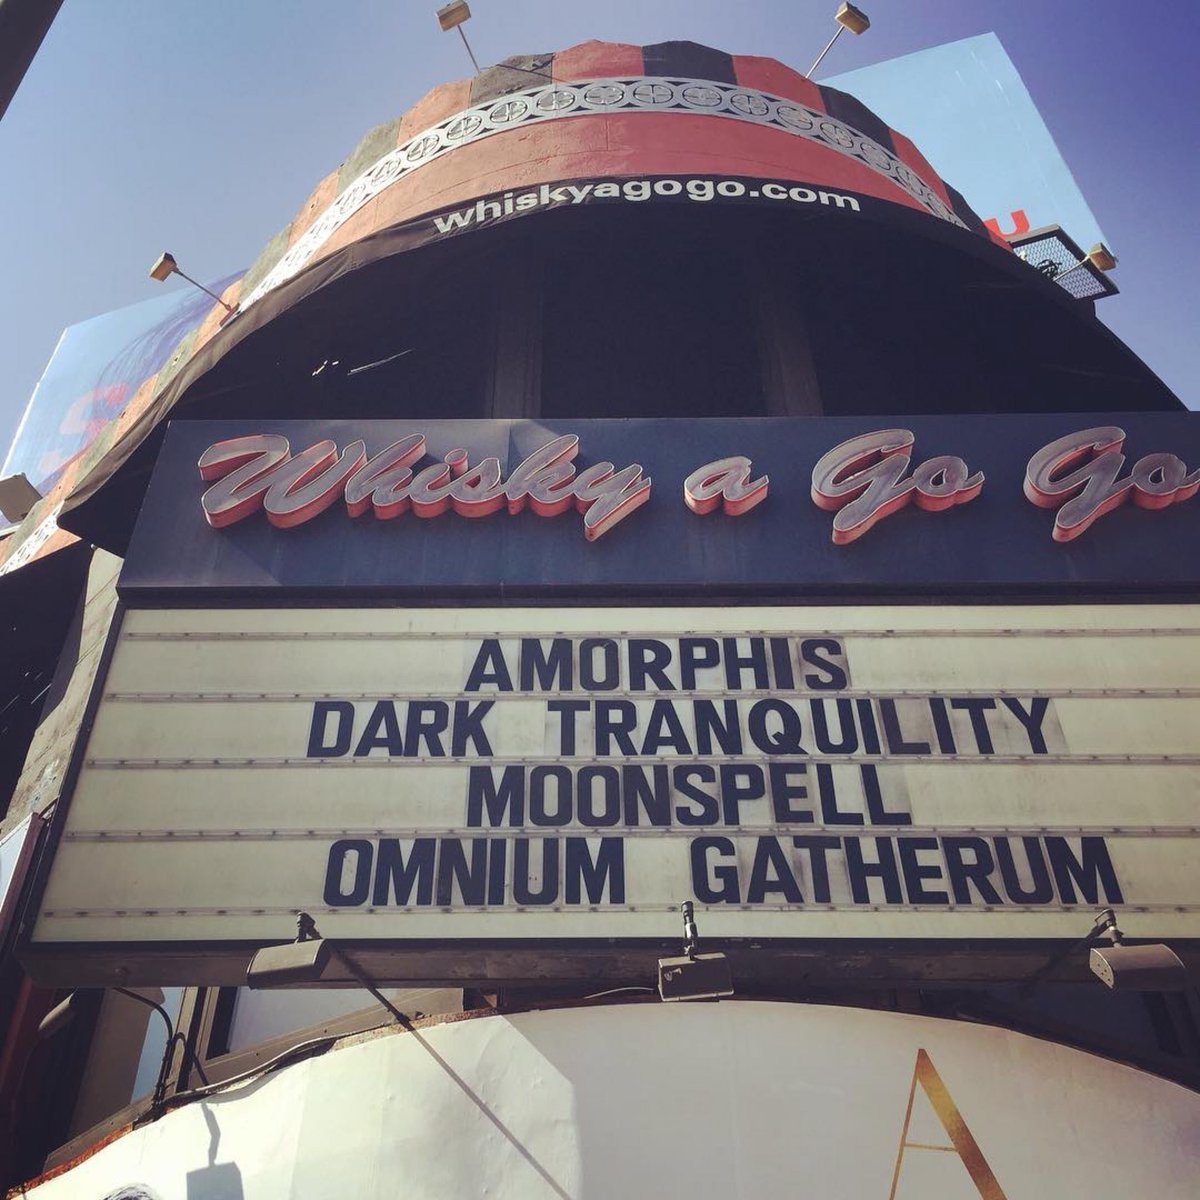 🇺🇸 Today's venue! #amorphis #queenoftimetour #darktranquillity #moonspell #omniumgatherum @TheWhiskyAGoGo https://t.co/iMafYYla3H